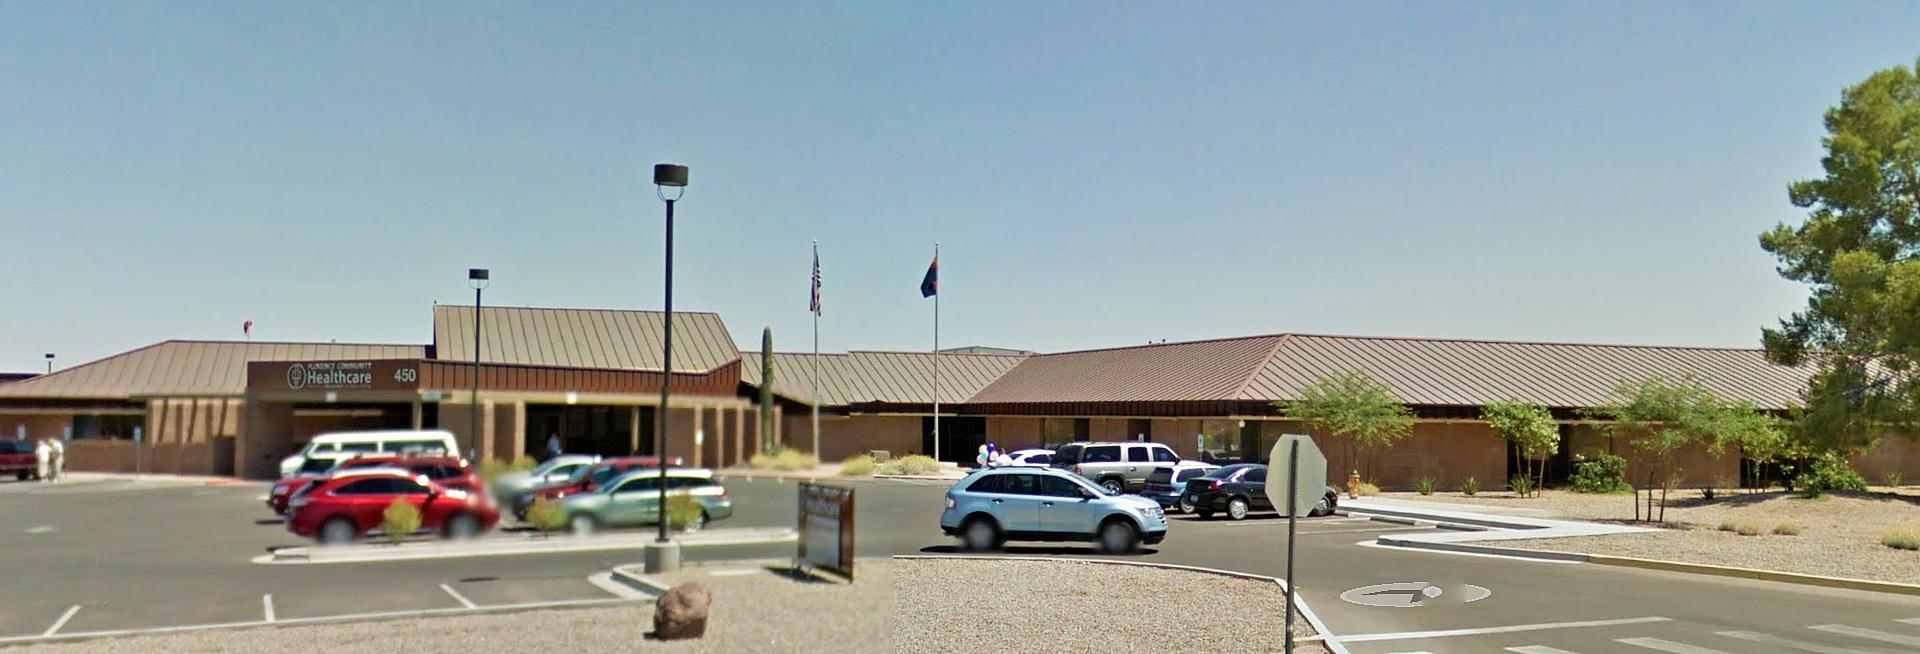 Central Arizona Medical Center (United States of America)